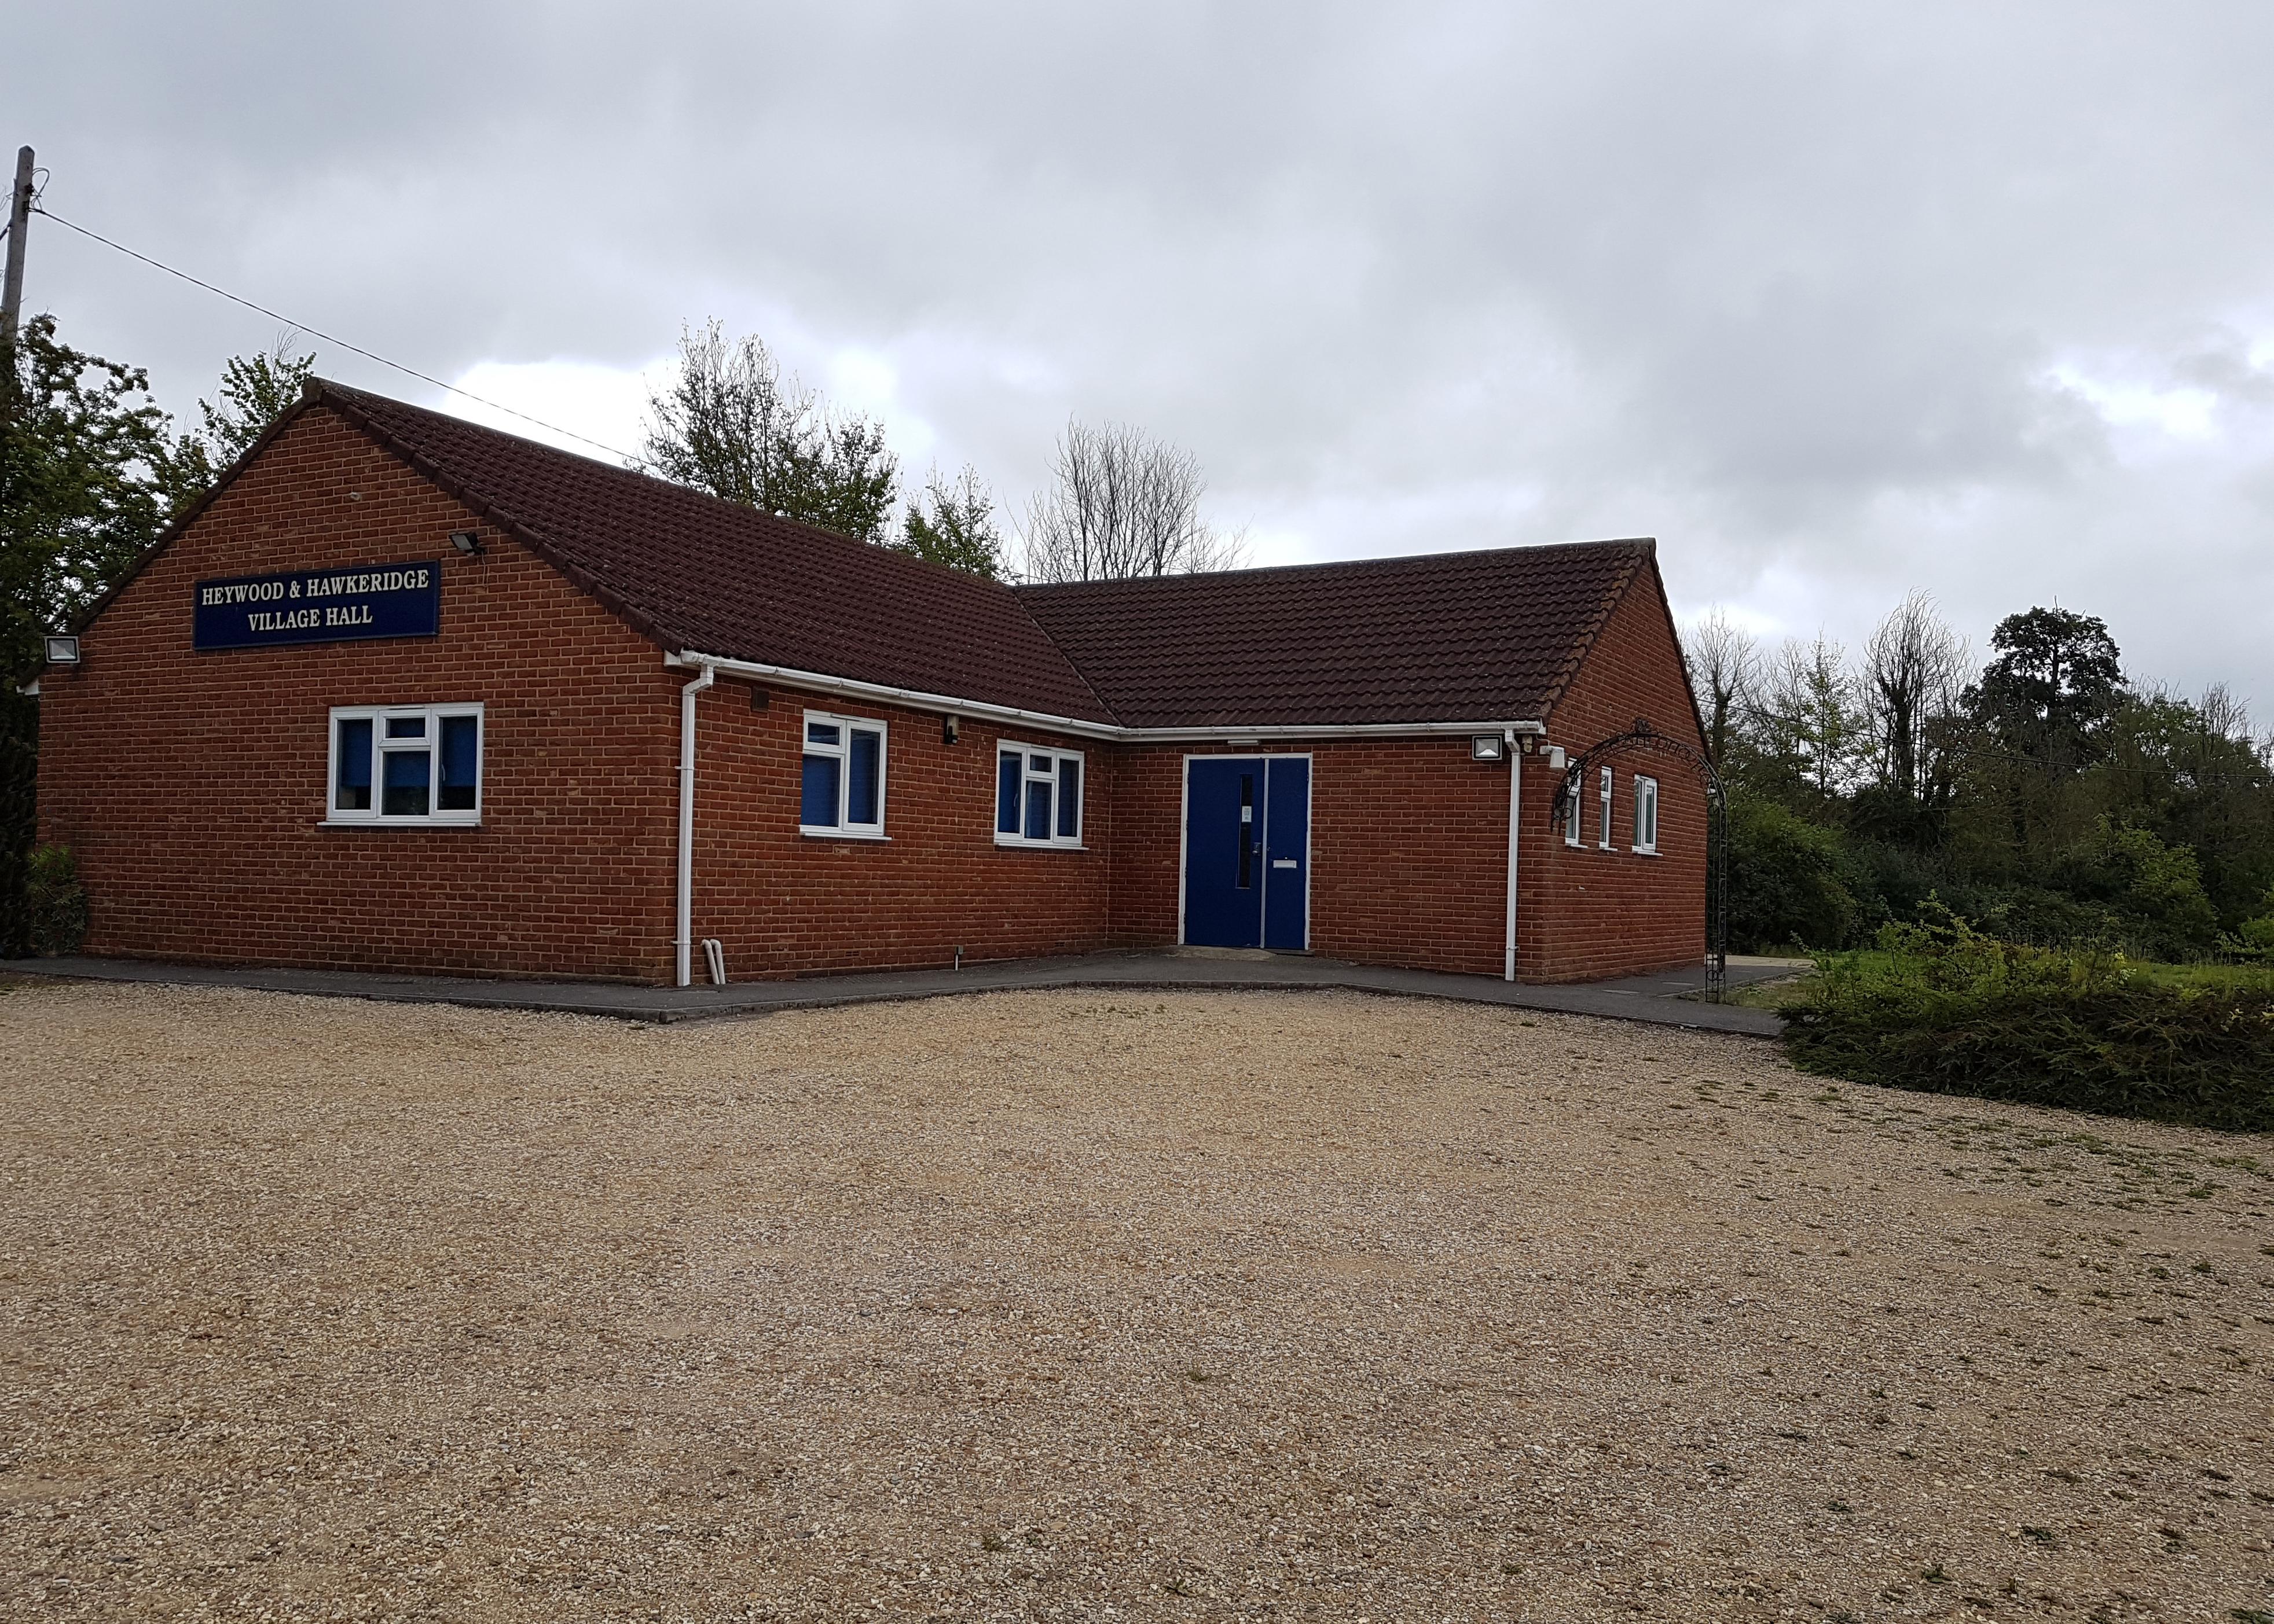 Heywood and Hawkeridge Village Hall